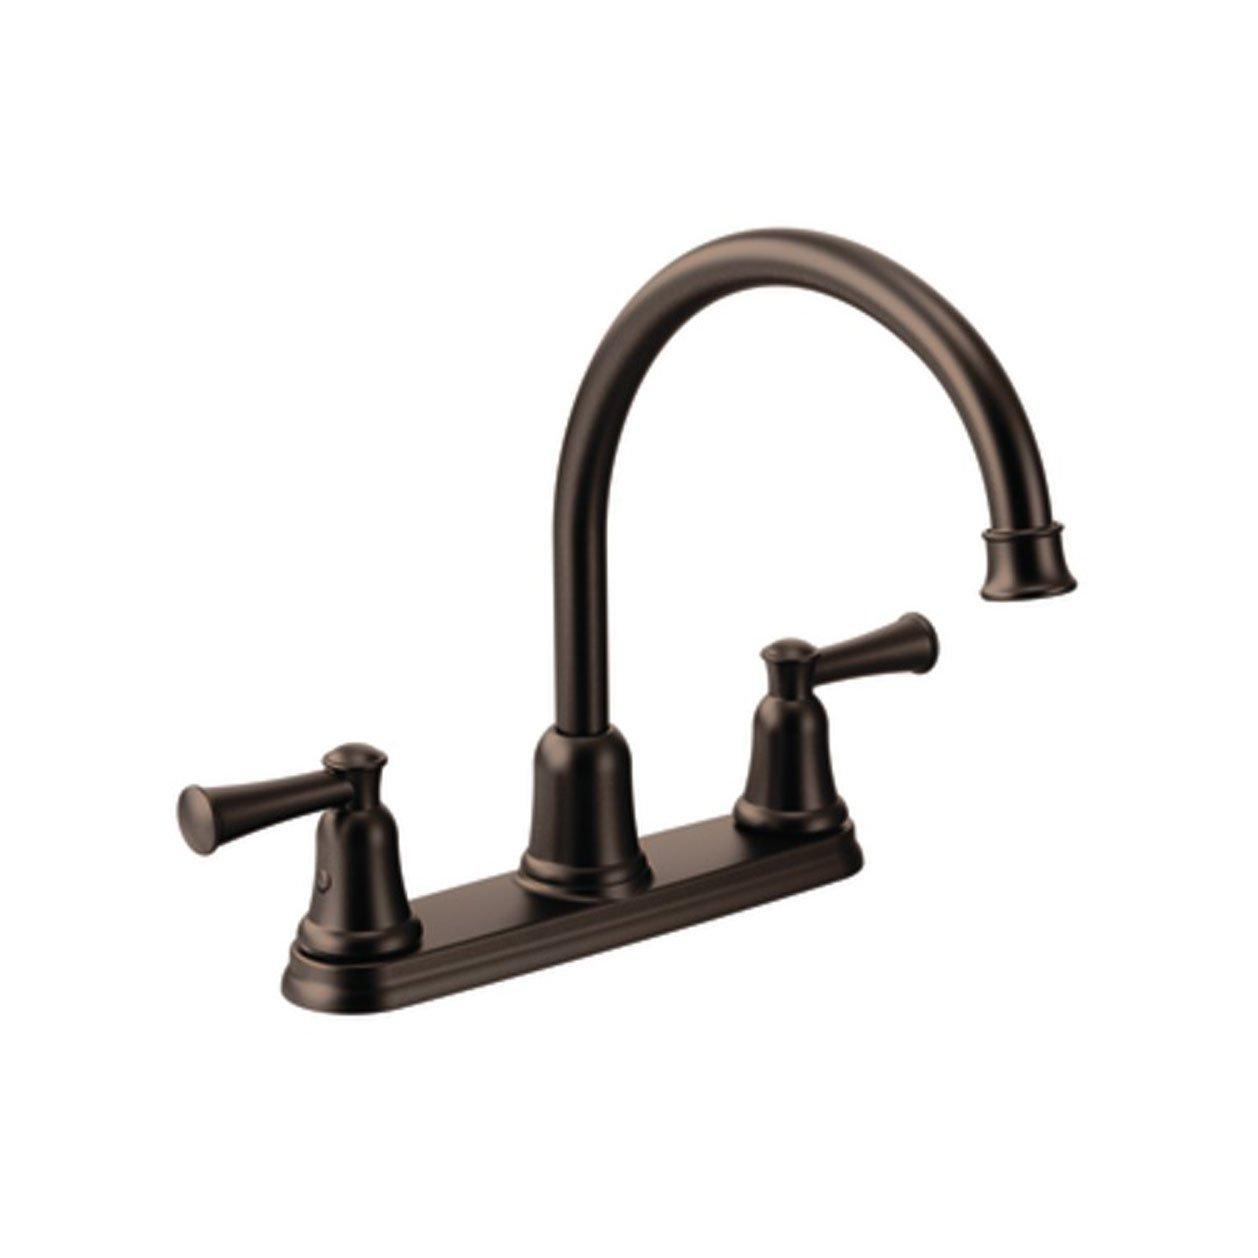 Cleveland Faucets CA41611OWB Capstone High-Arc Spout Two-Handle Kitchen Faucet, Old World Bronze